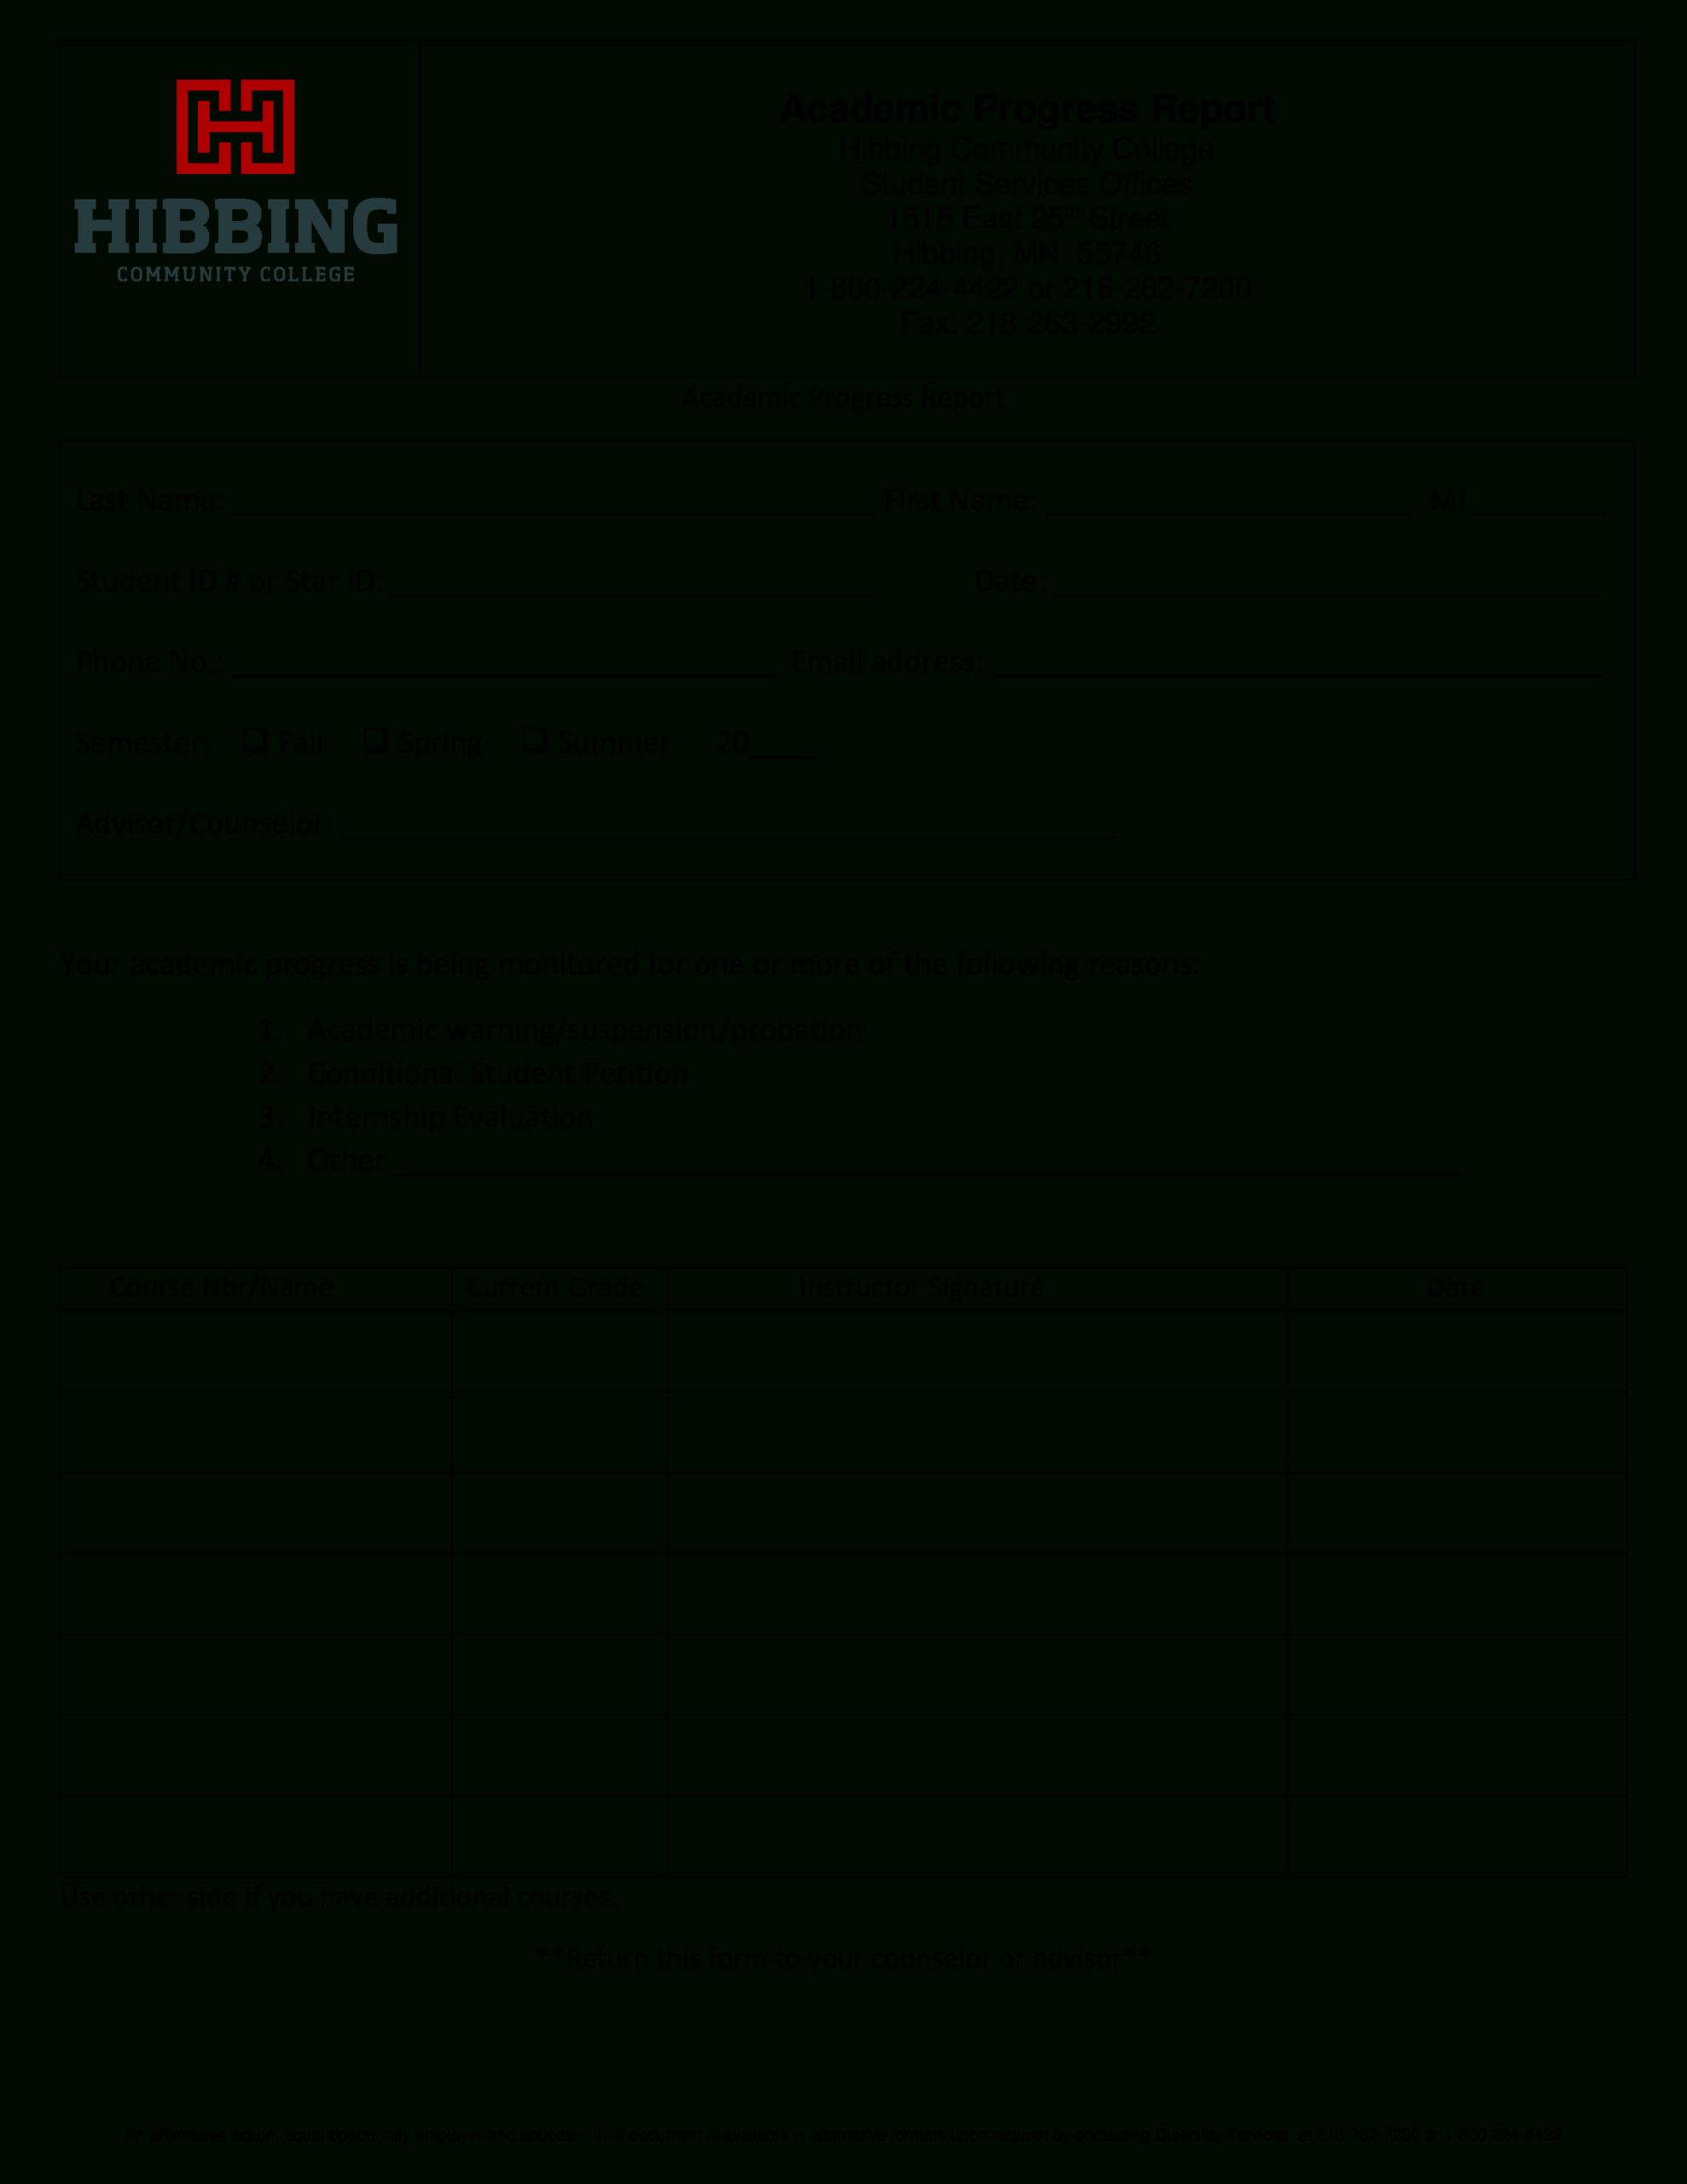 010 Student Progress Report Template Ideas Af7F4Bc5D765 1 throughout School Progress Report Template